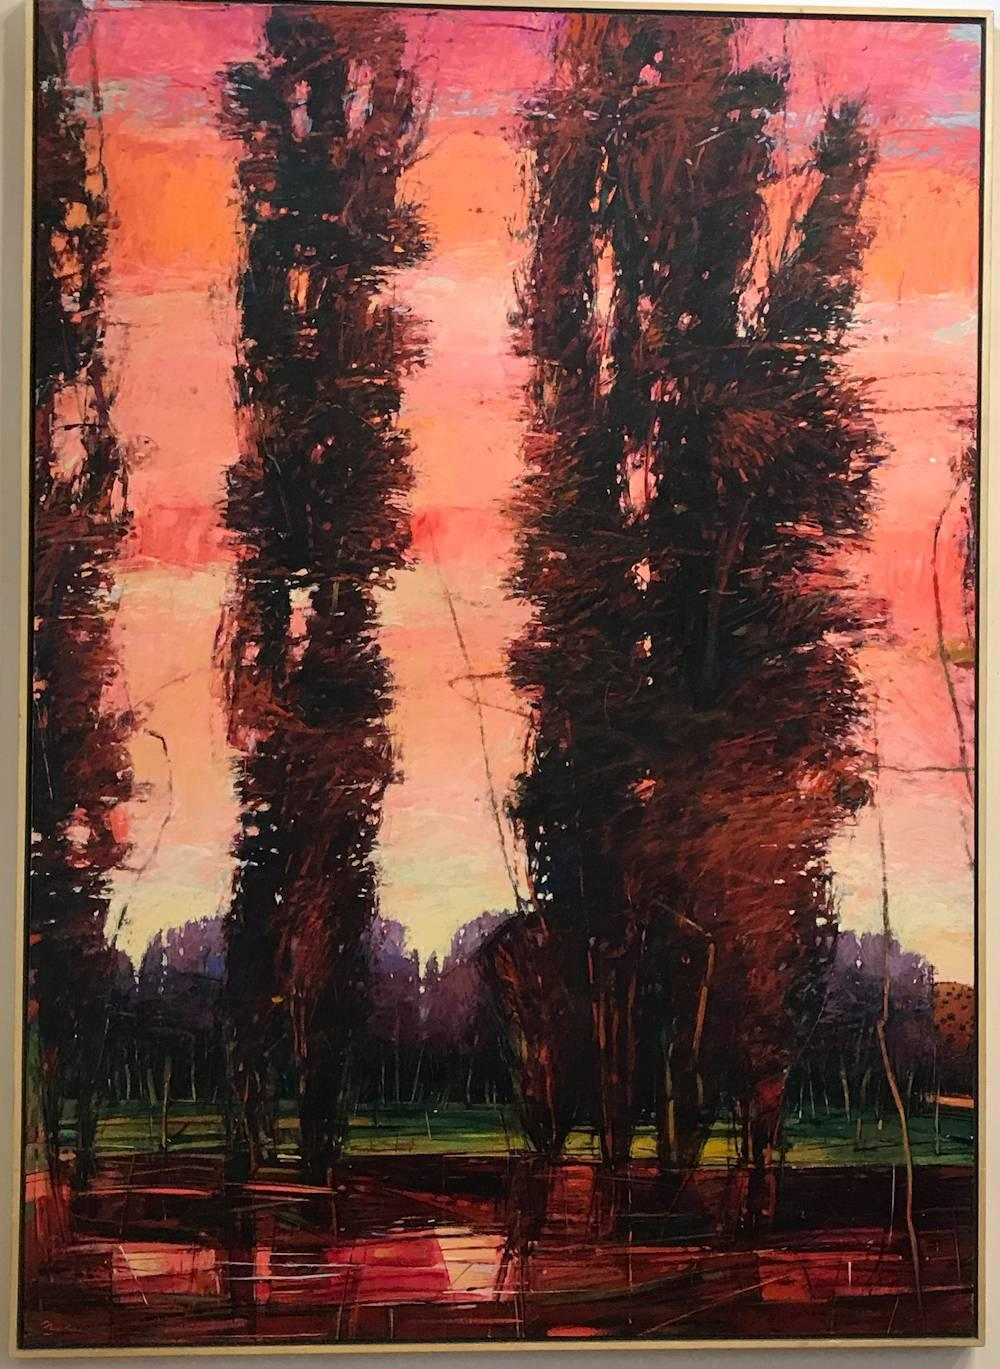 Big Tesuque Poplars, John Fincher, Santa Fe oil on canvas, trees, red, brown